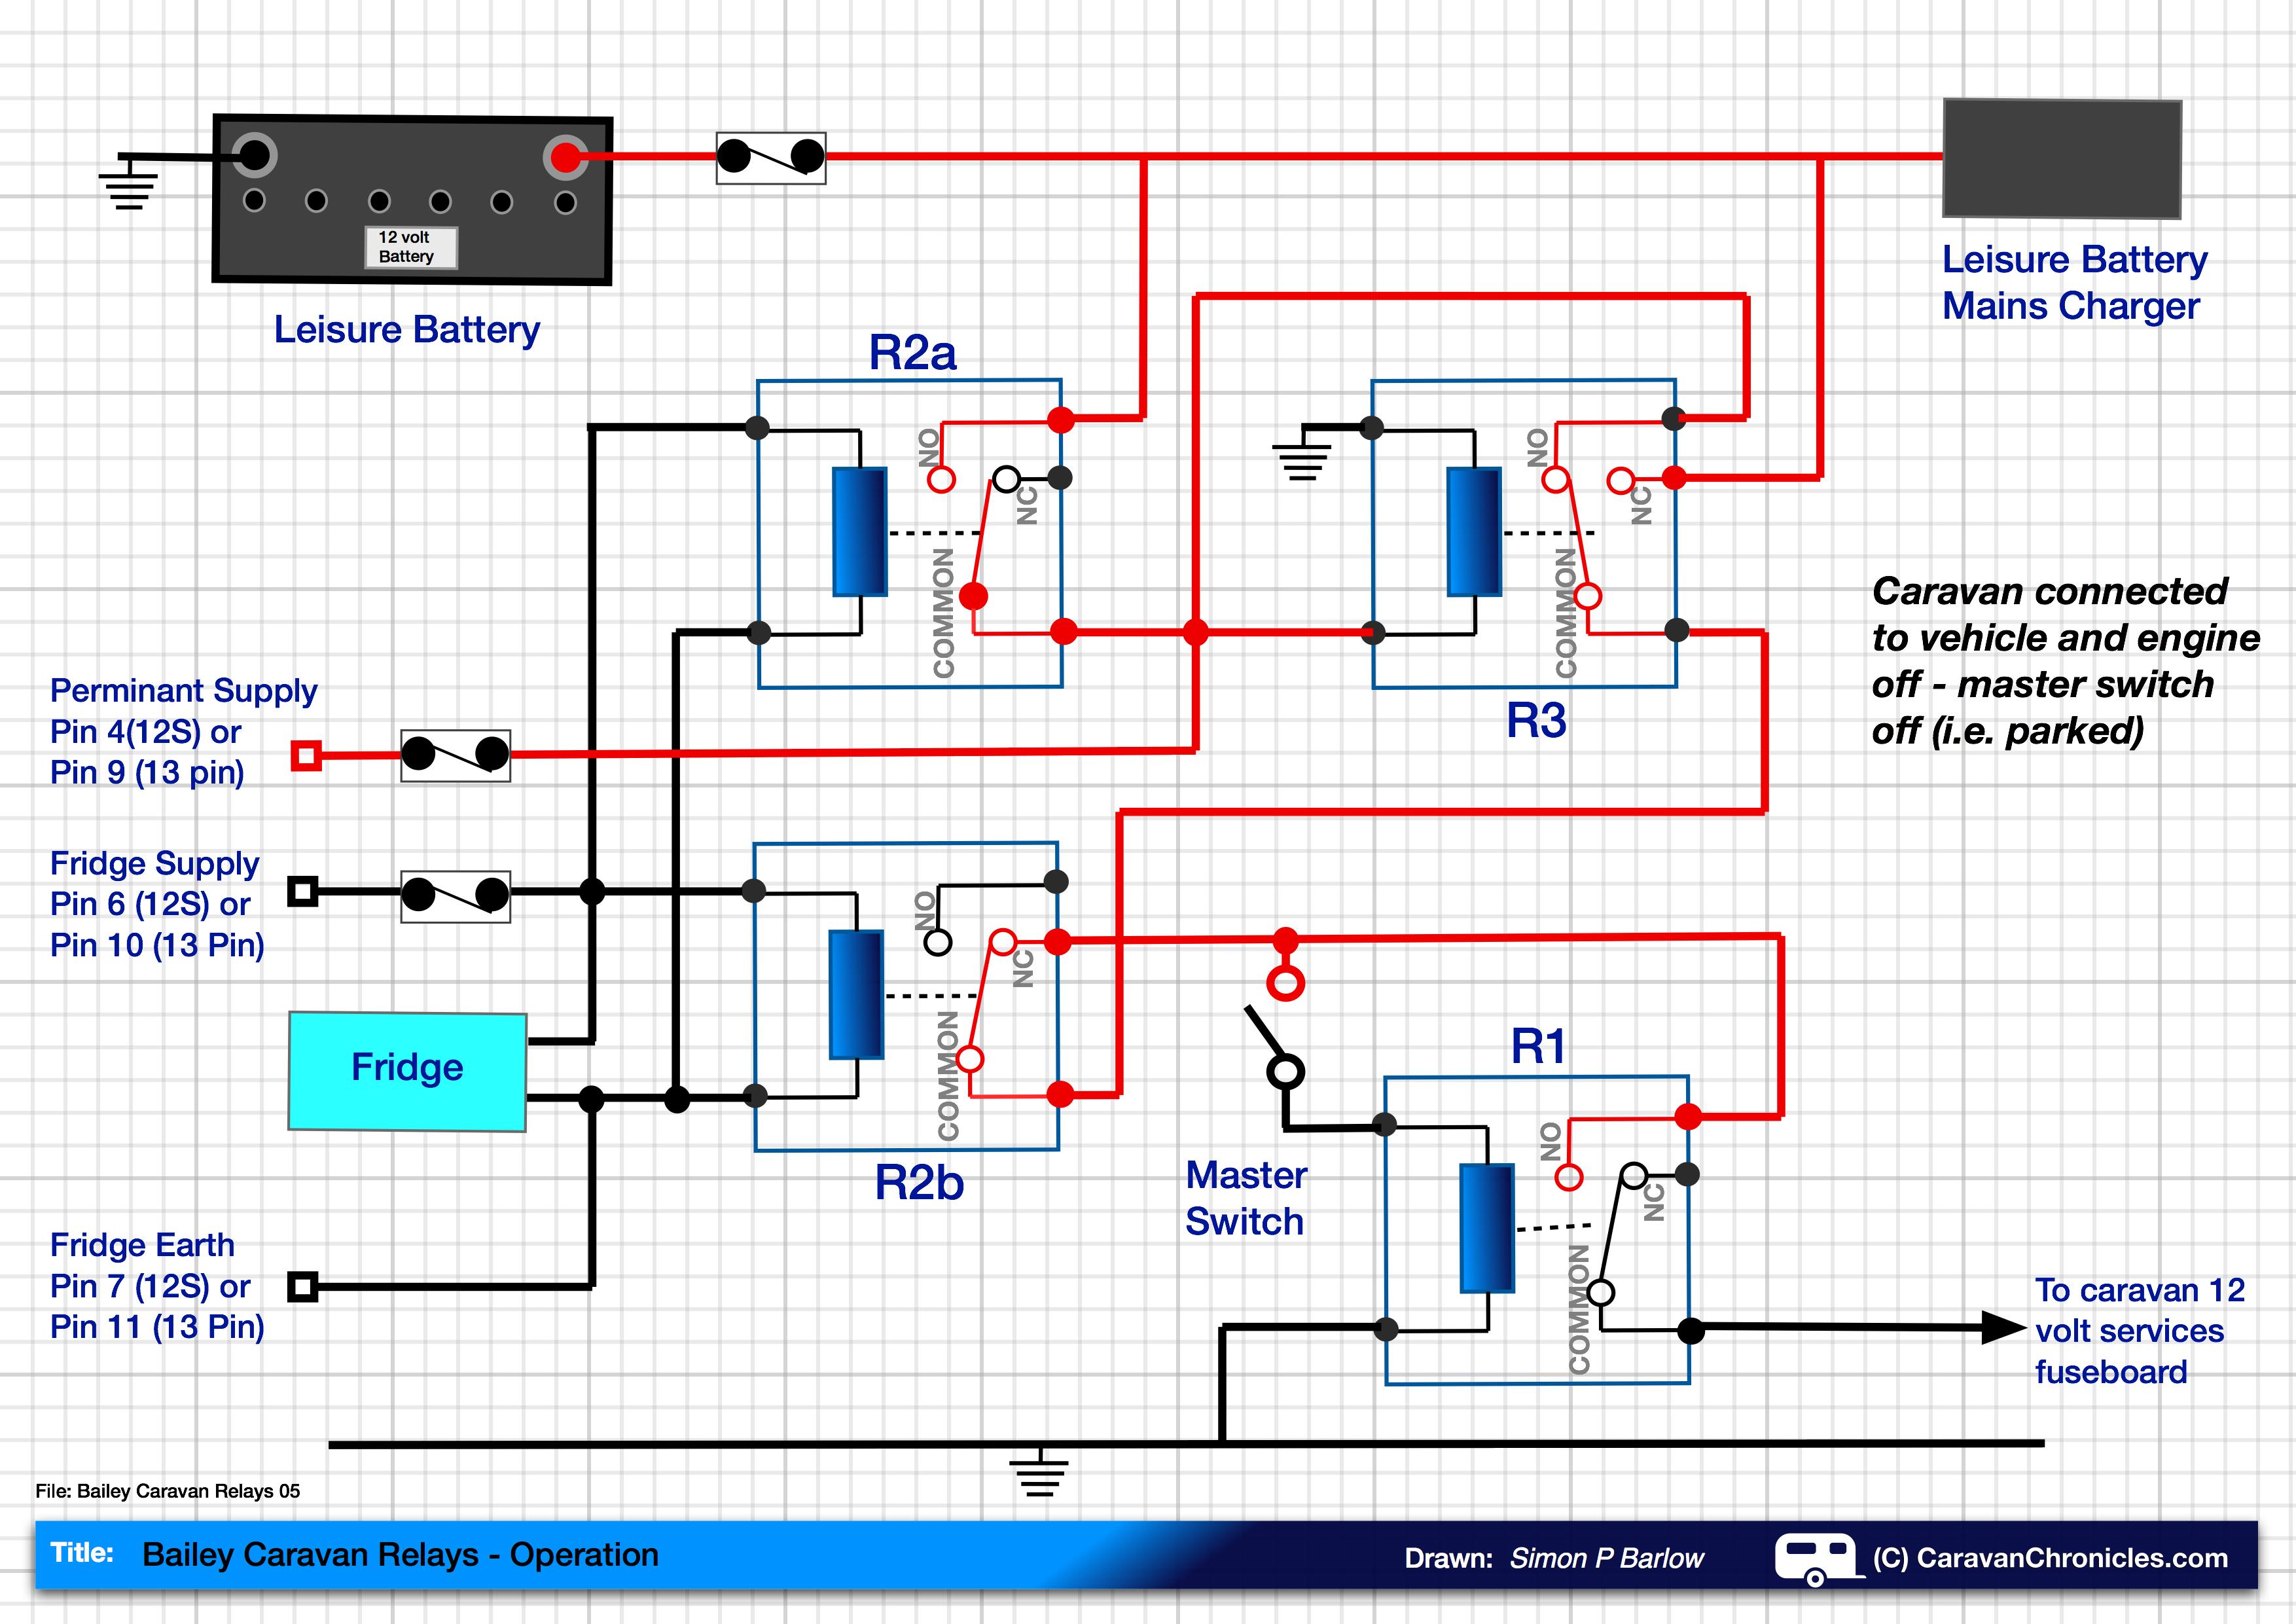 Caravan Mains Plug Wiring Diagram A Readers Puzzle Answered Caravan Chronicles